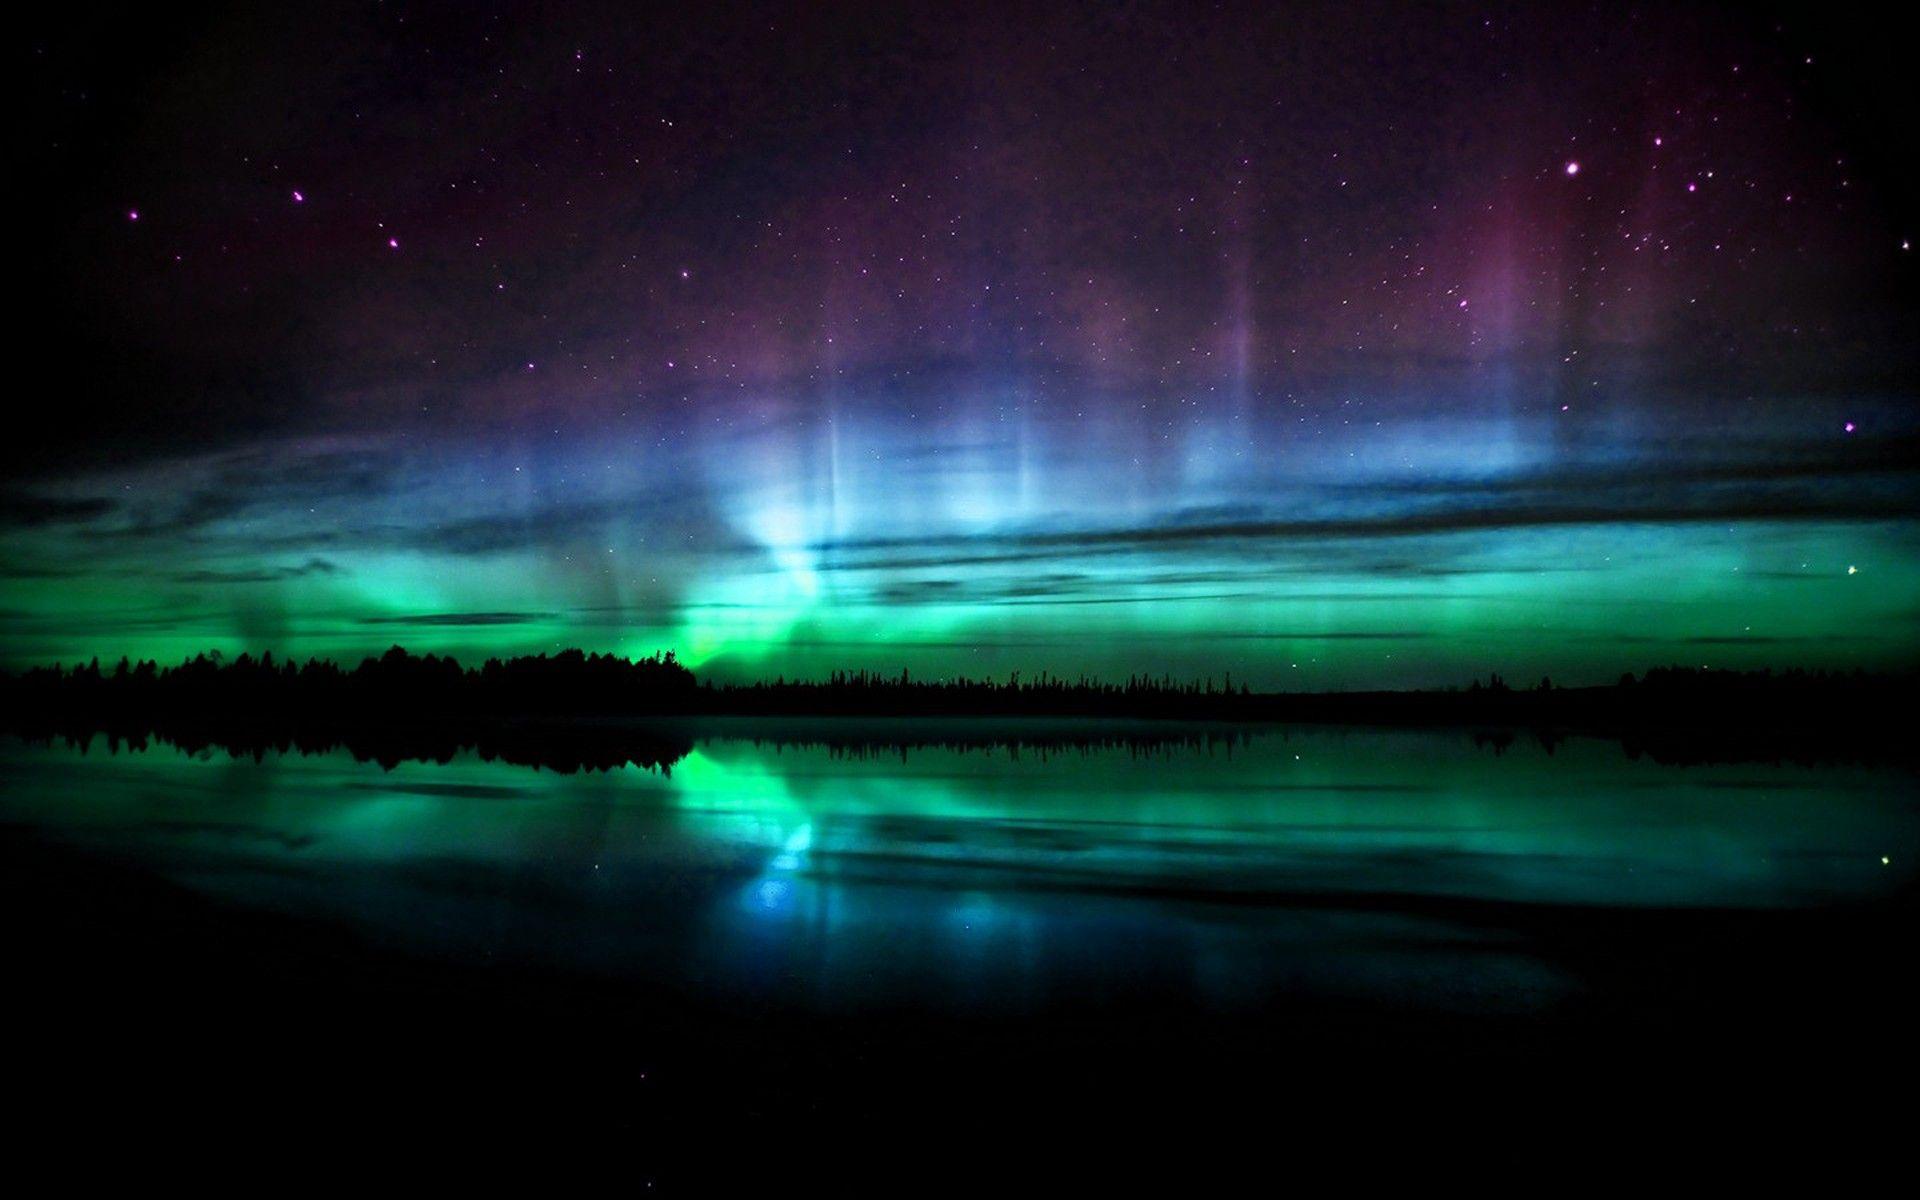 Aurora Borealis Northern Lights Wallpaper Aurora Borealis Northern Lights Green Aurora Borealis